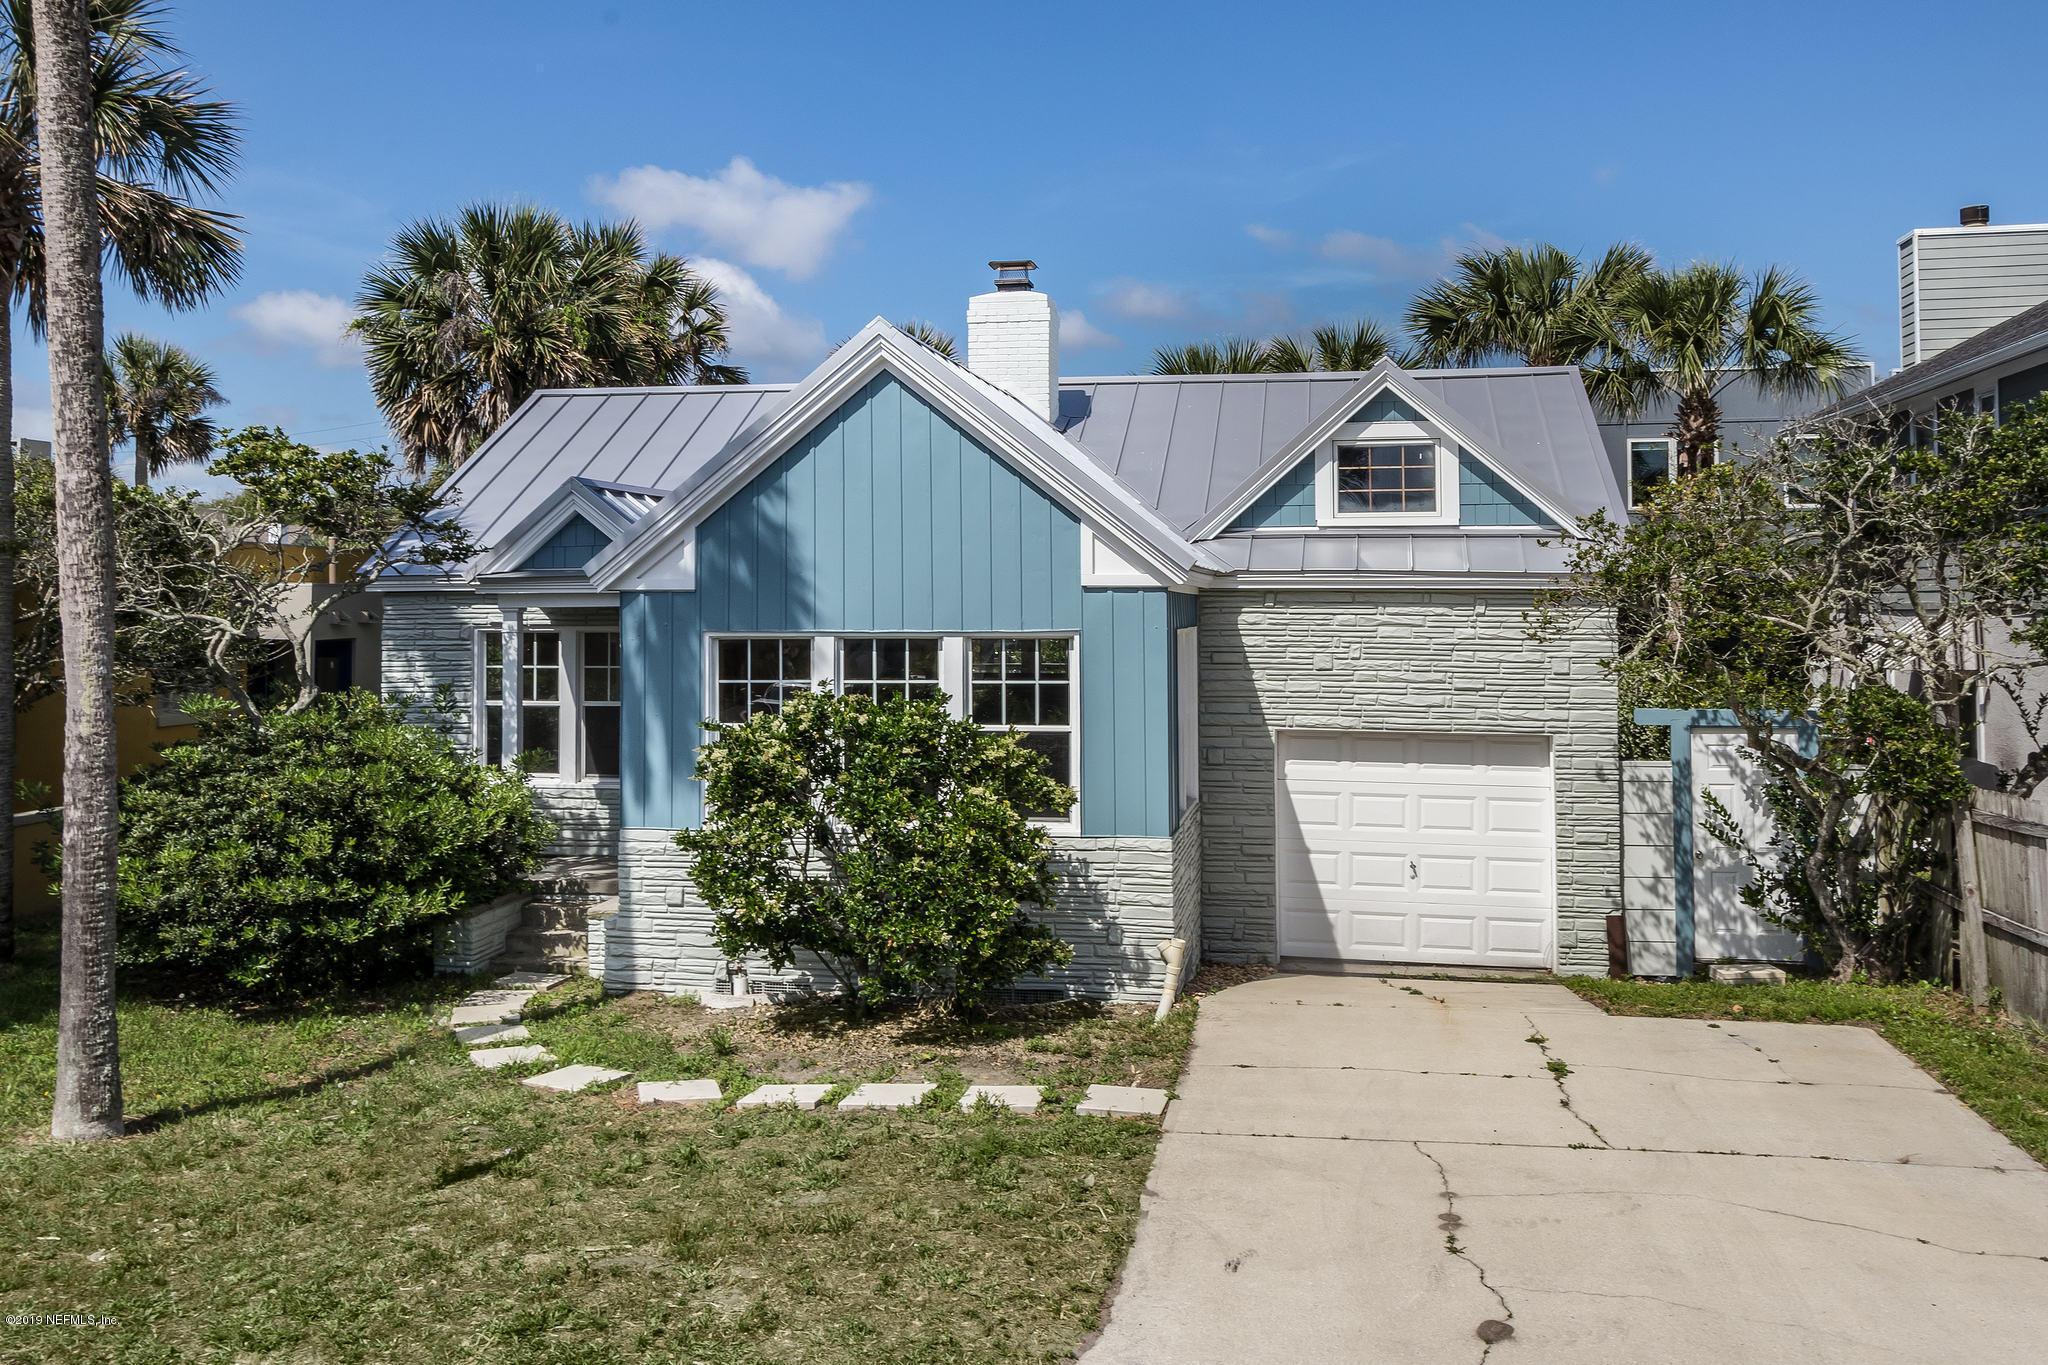 838 OCEAN, ATLANTIC BEACH, FLORIDA 32233, 3 Bedrooms Bedrooms, ,2 BathroomsBathrooms,Residential - single family,For sale,OCEAN,991359